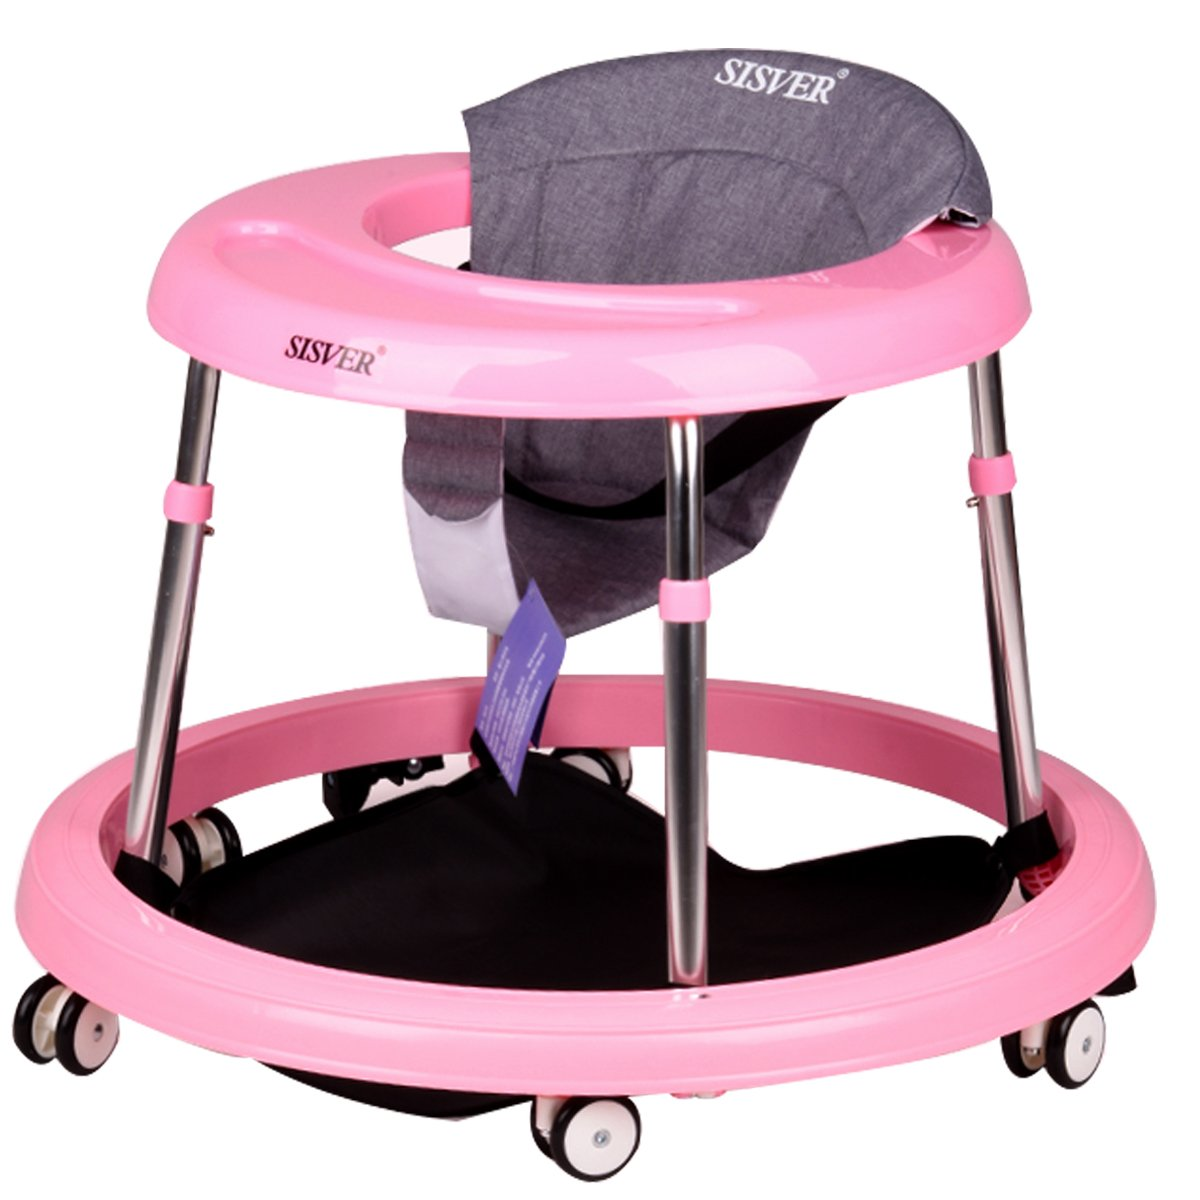 SISVER Baby Walker Baby Walking 6-18 Months Anti-Rollover Height Adjustable Foldable Germany